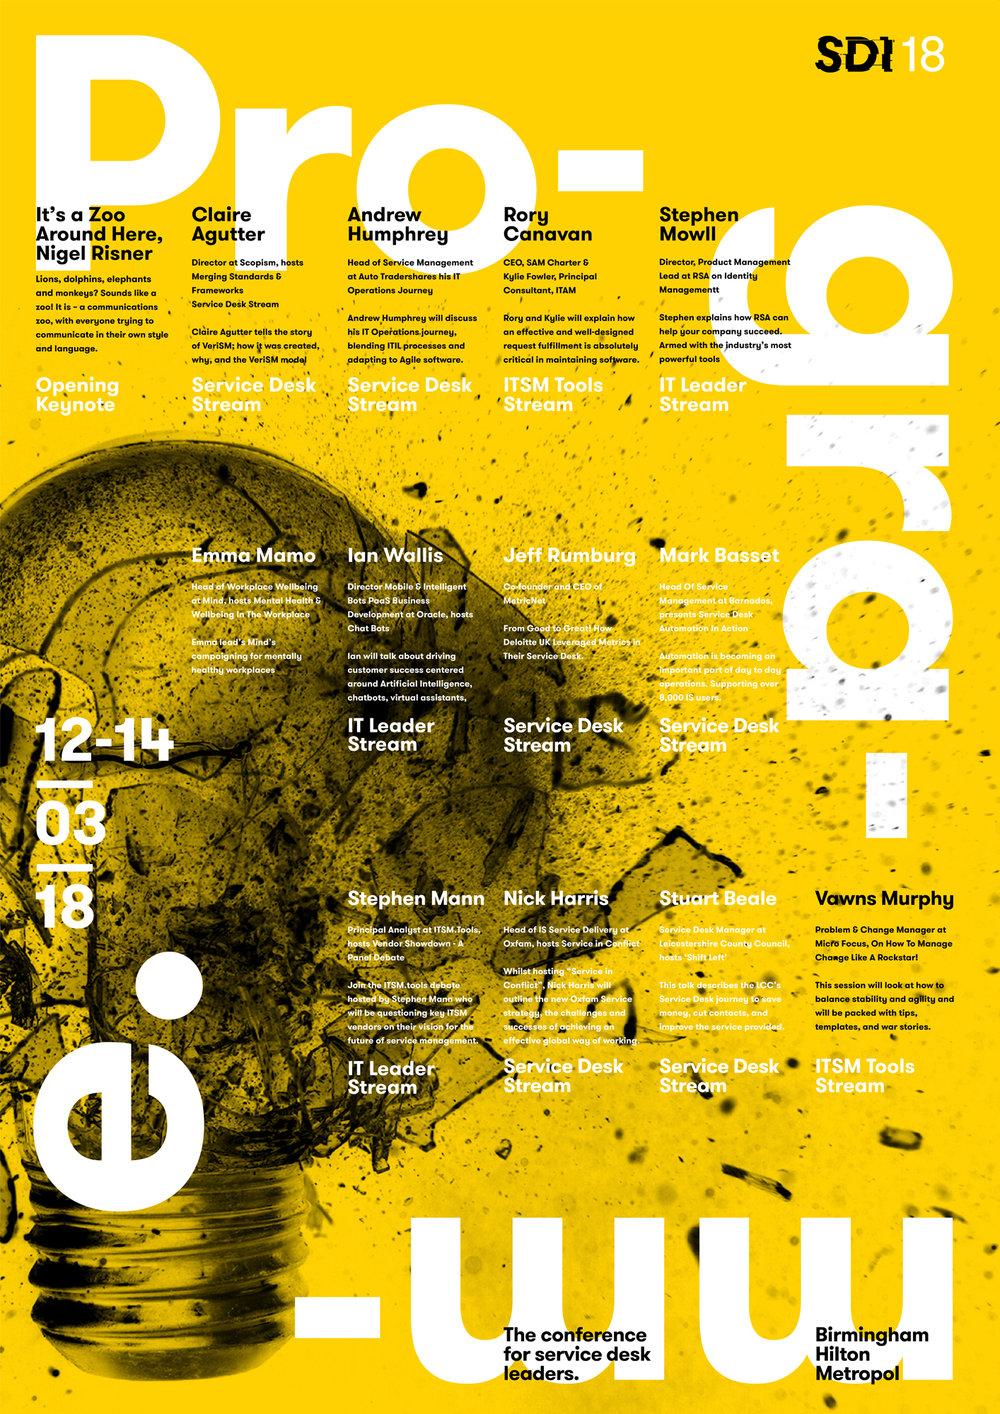 SDI 18 programme poster design - speakers